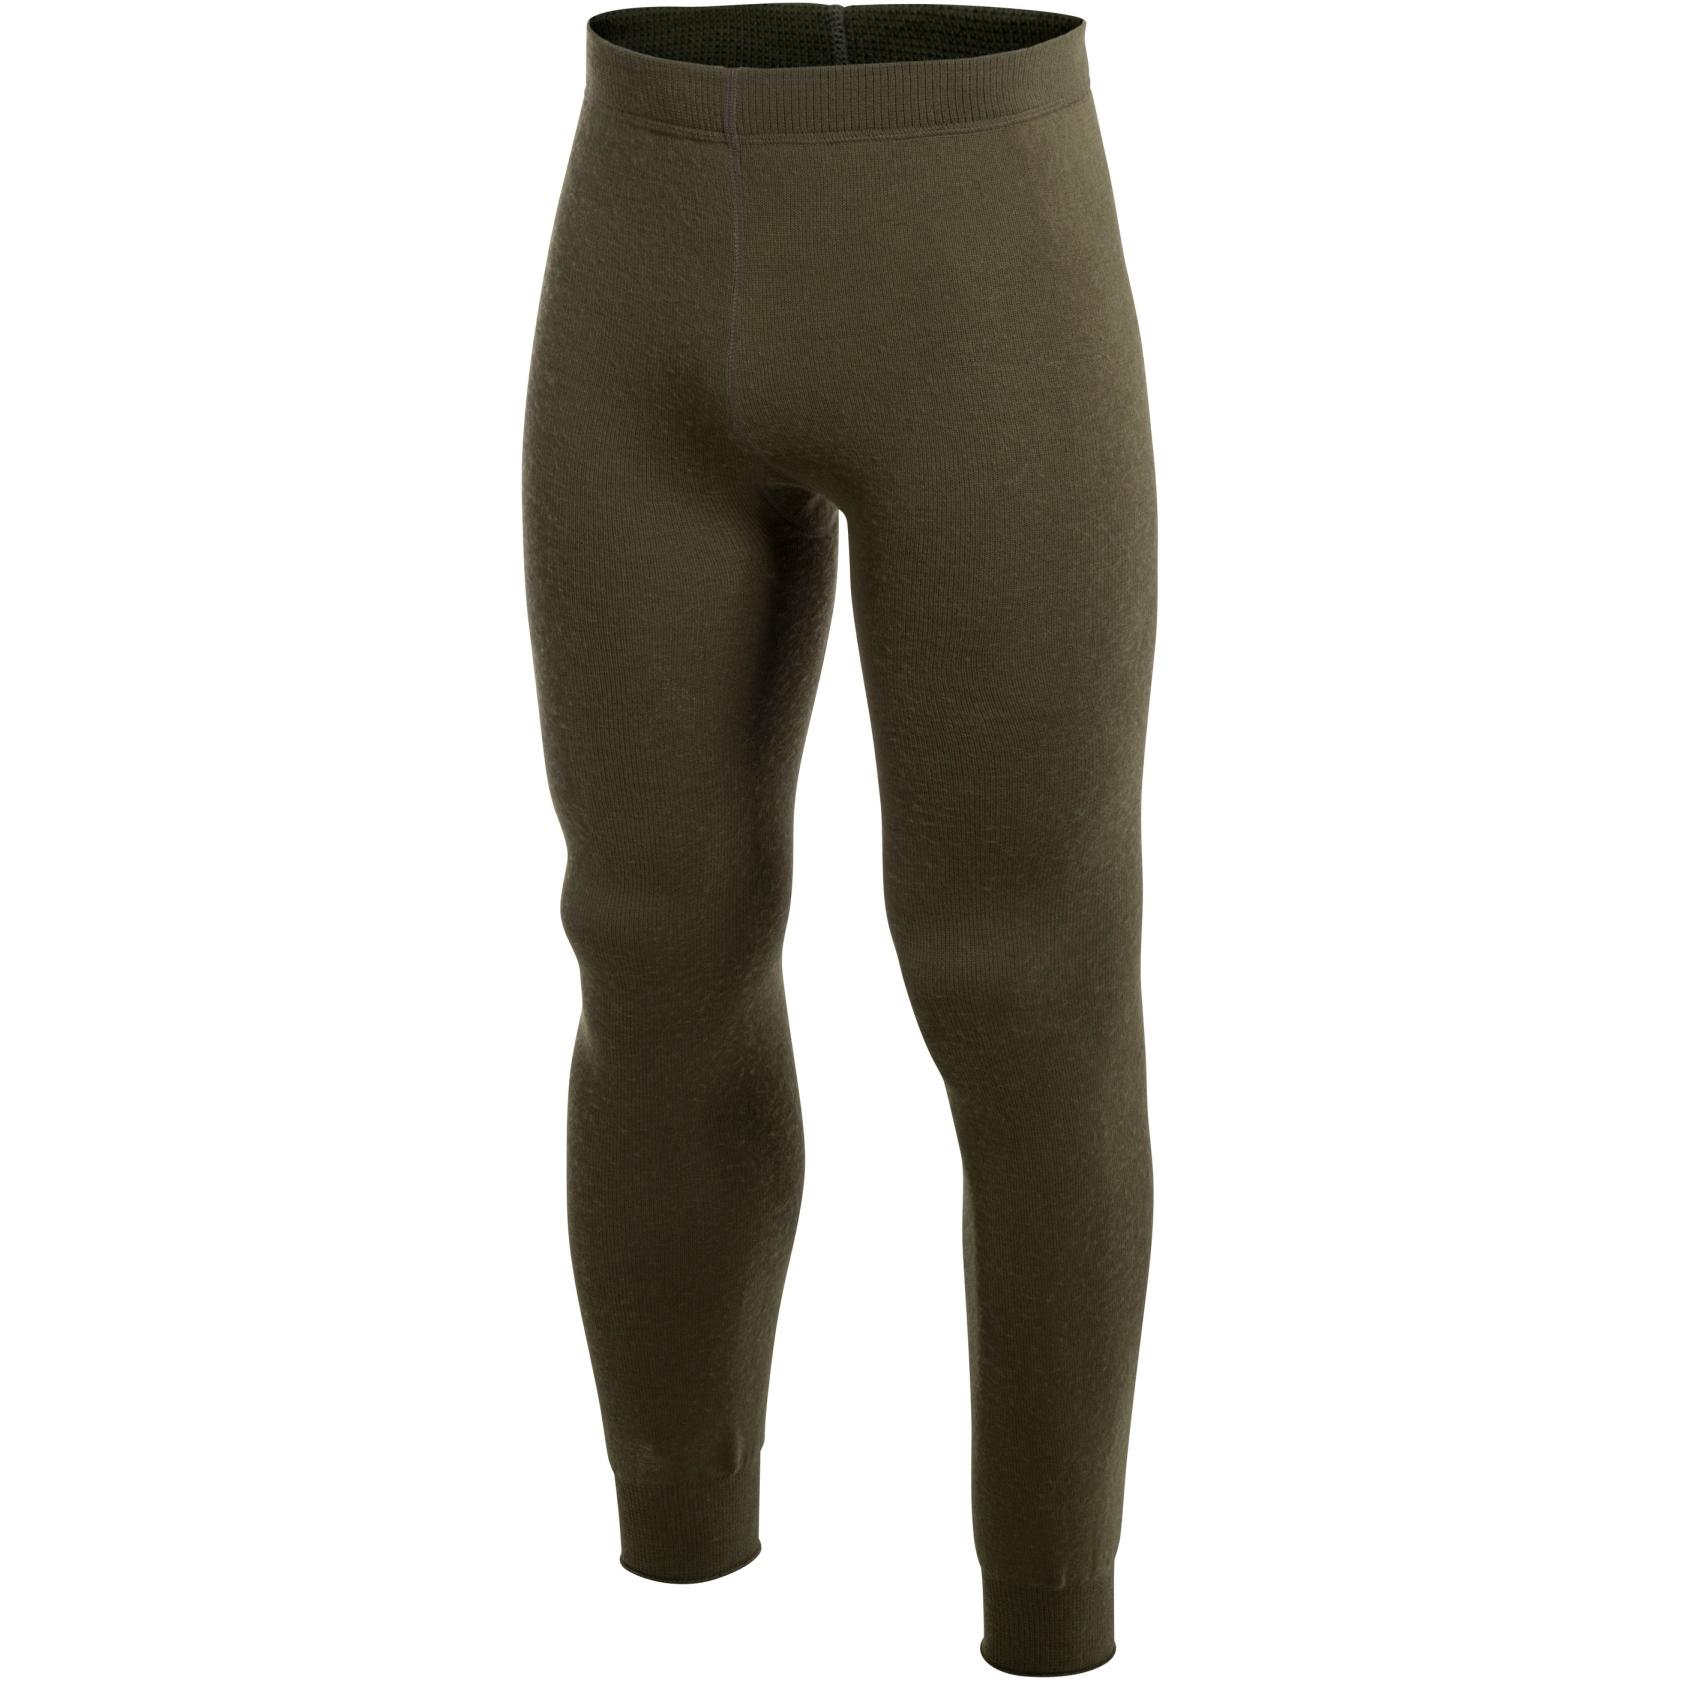 Woolpower Long Johns 200 Unisex Underpants - pine green